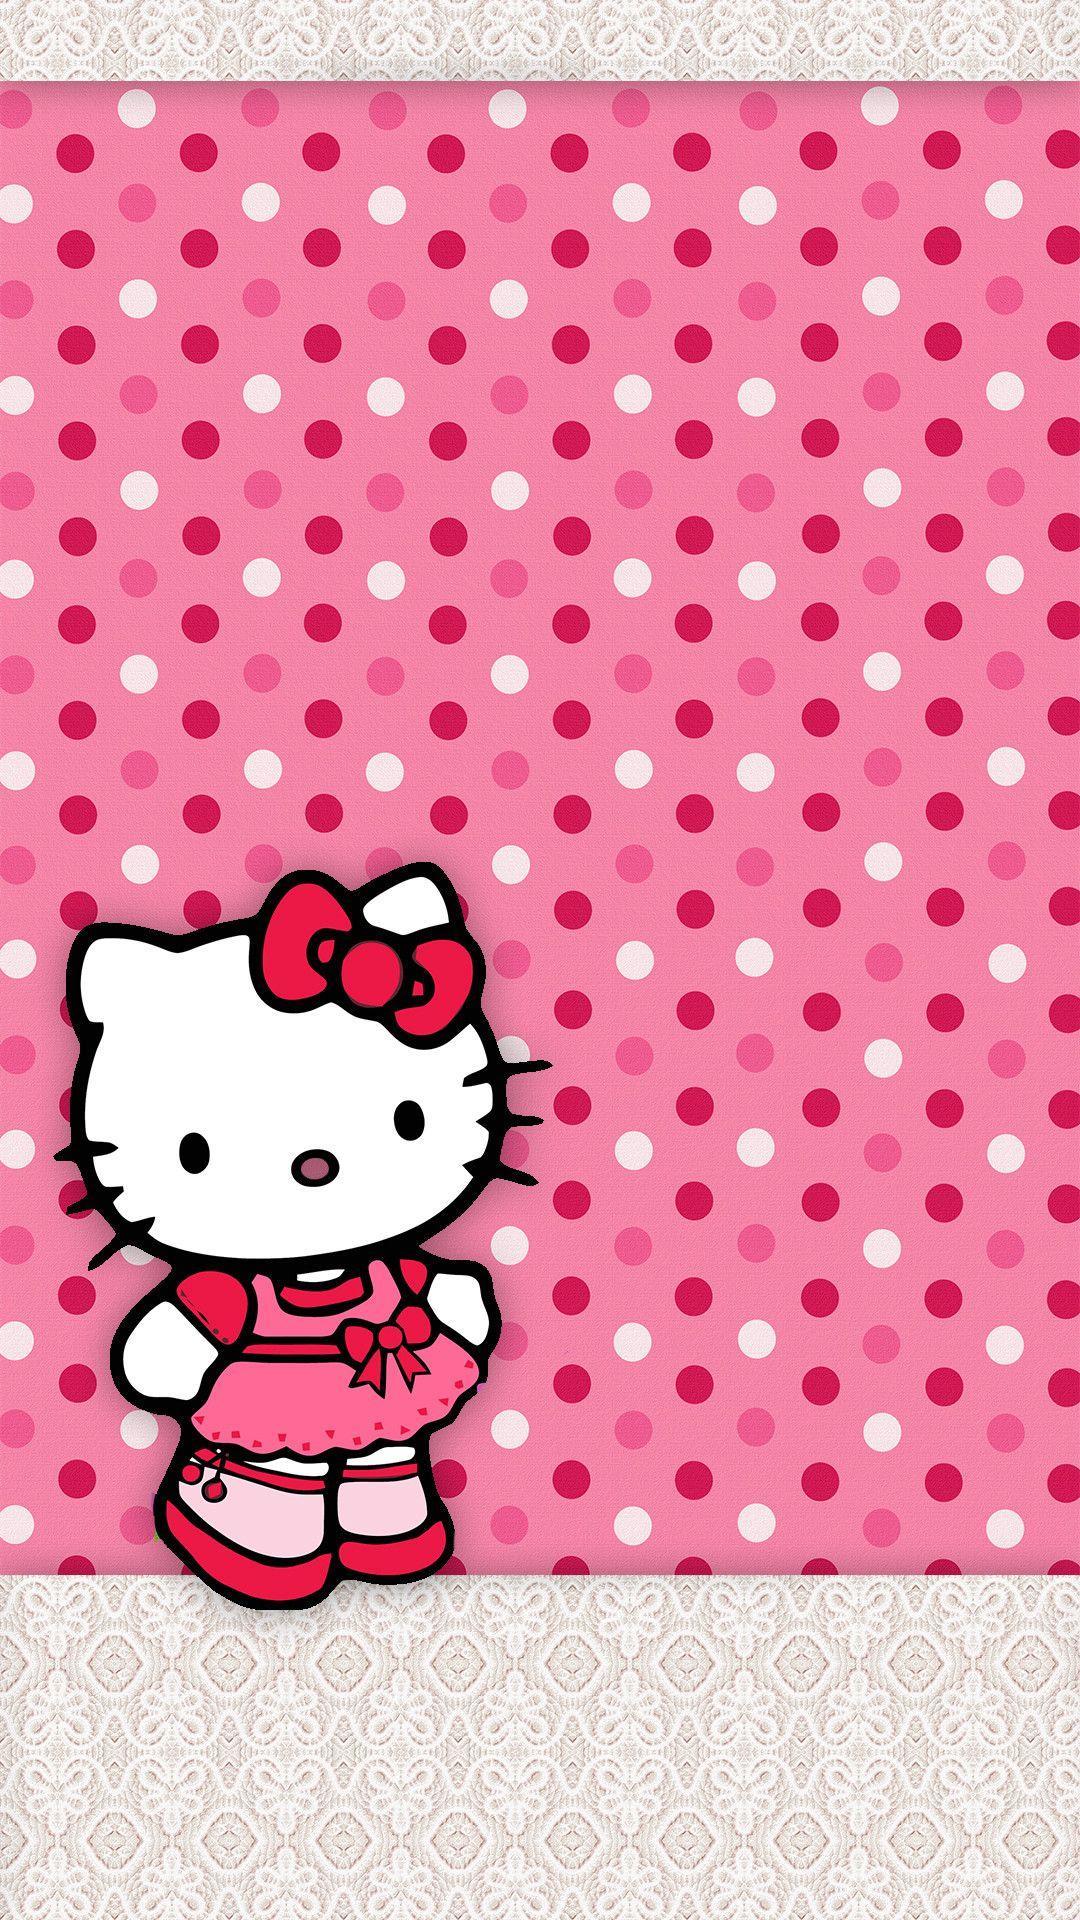 Wallpapers Hello Kitty Untuk Hp Wallpaper Cave